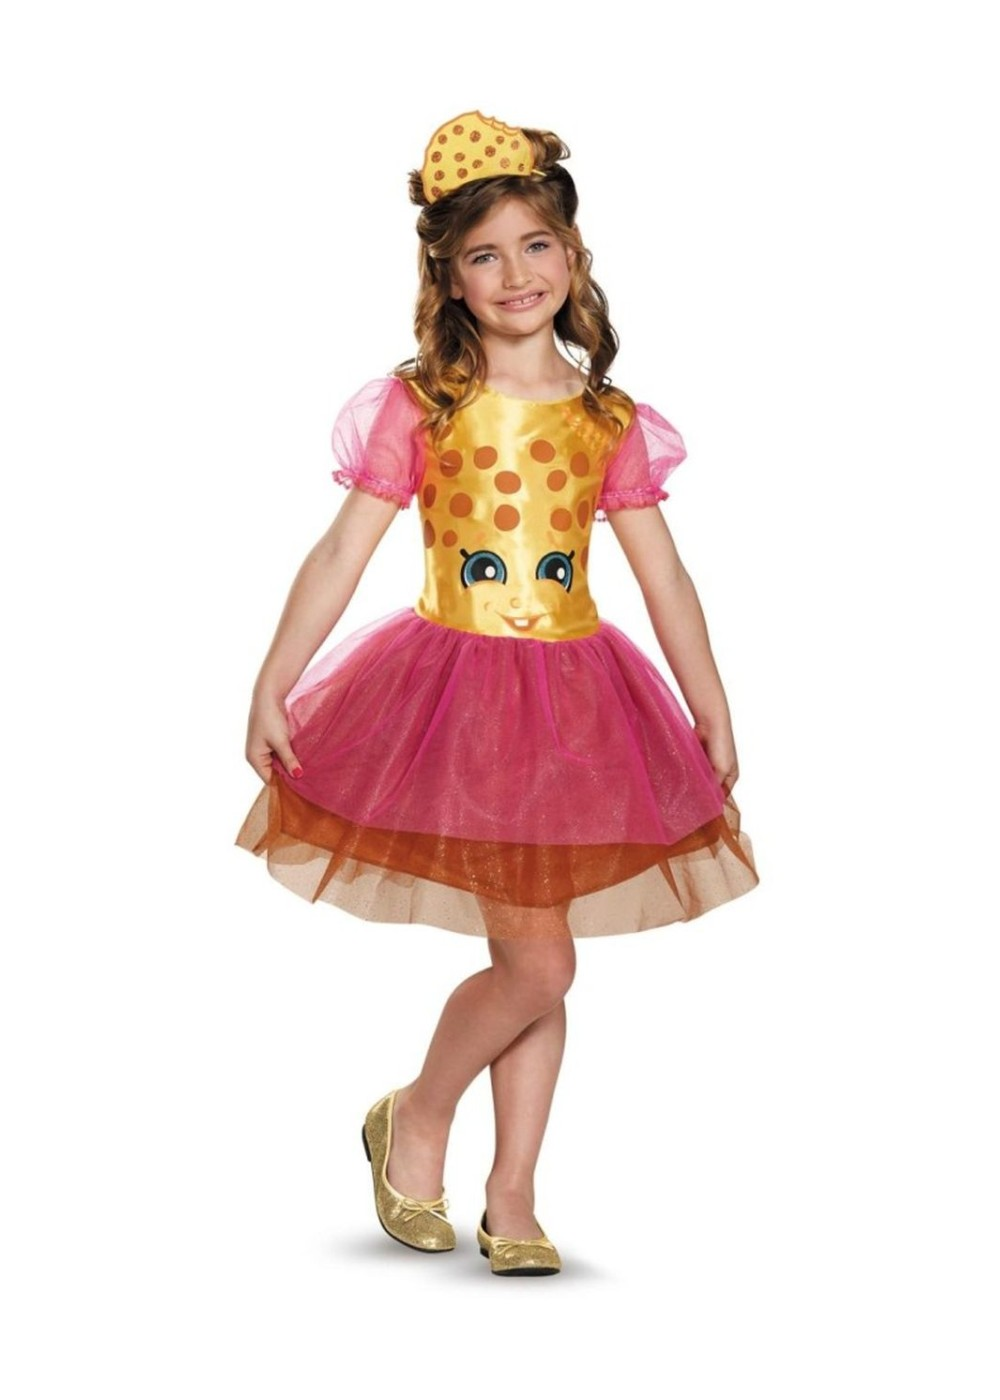 apple costumes - fruit costumes